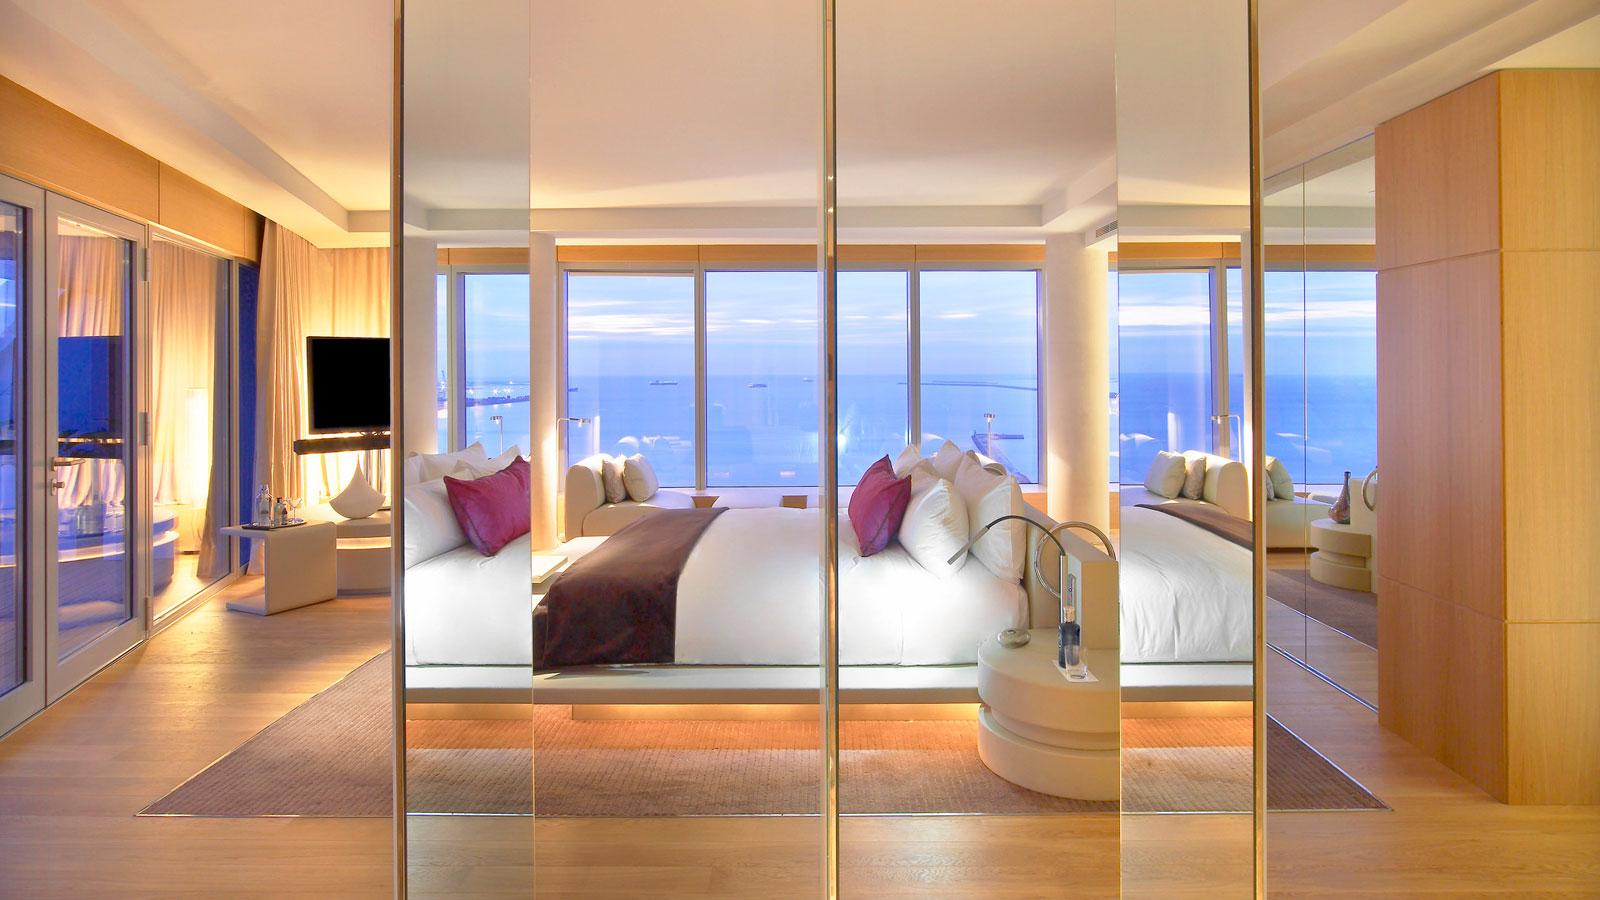 Hotel Barcelona W in Ricardo The Architecture Bofill by |